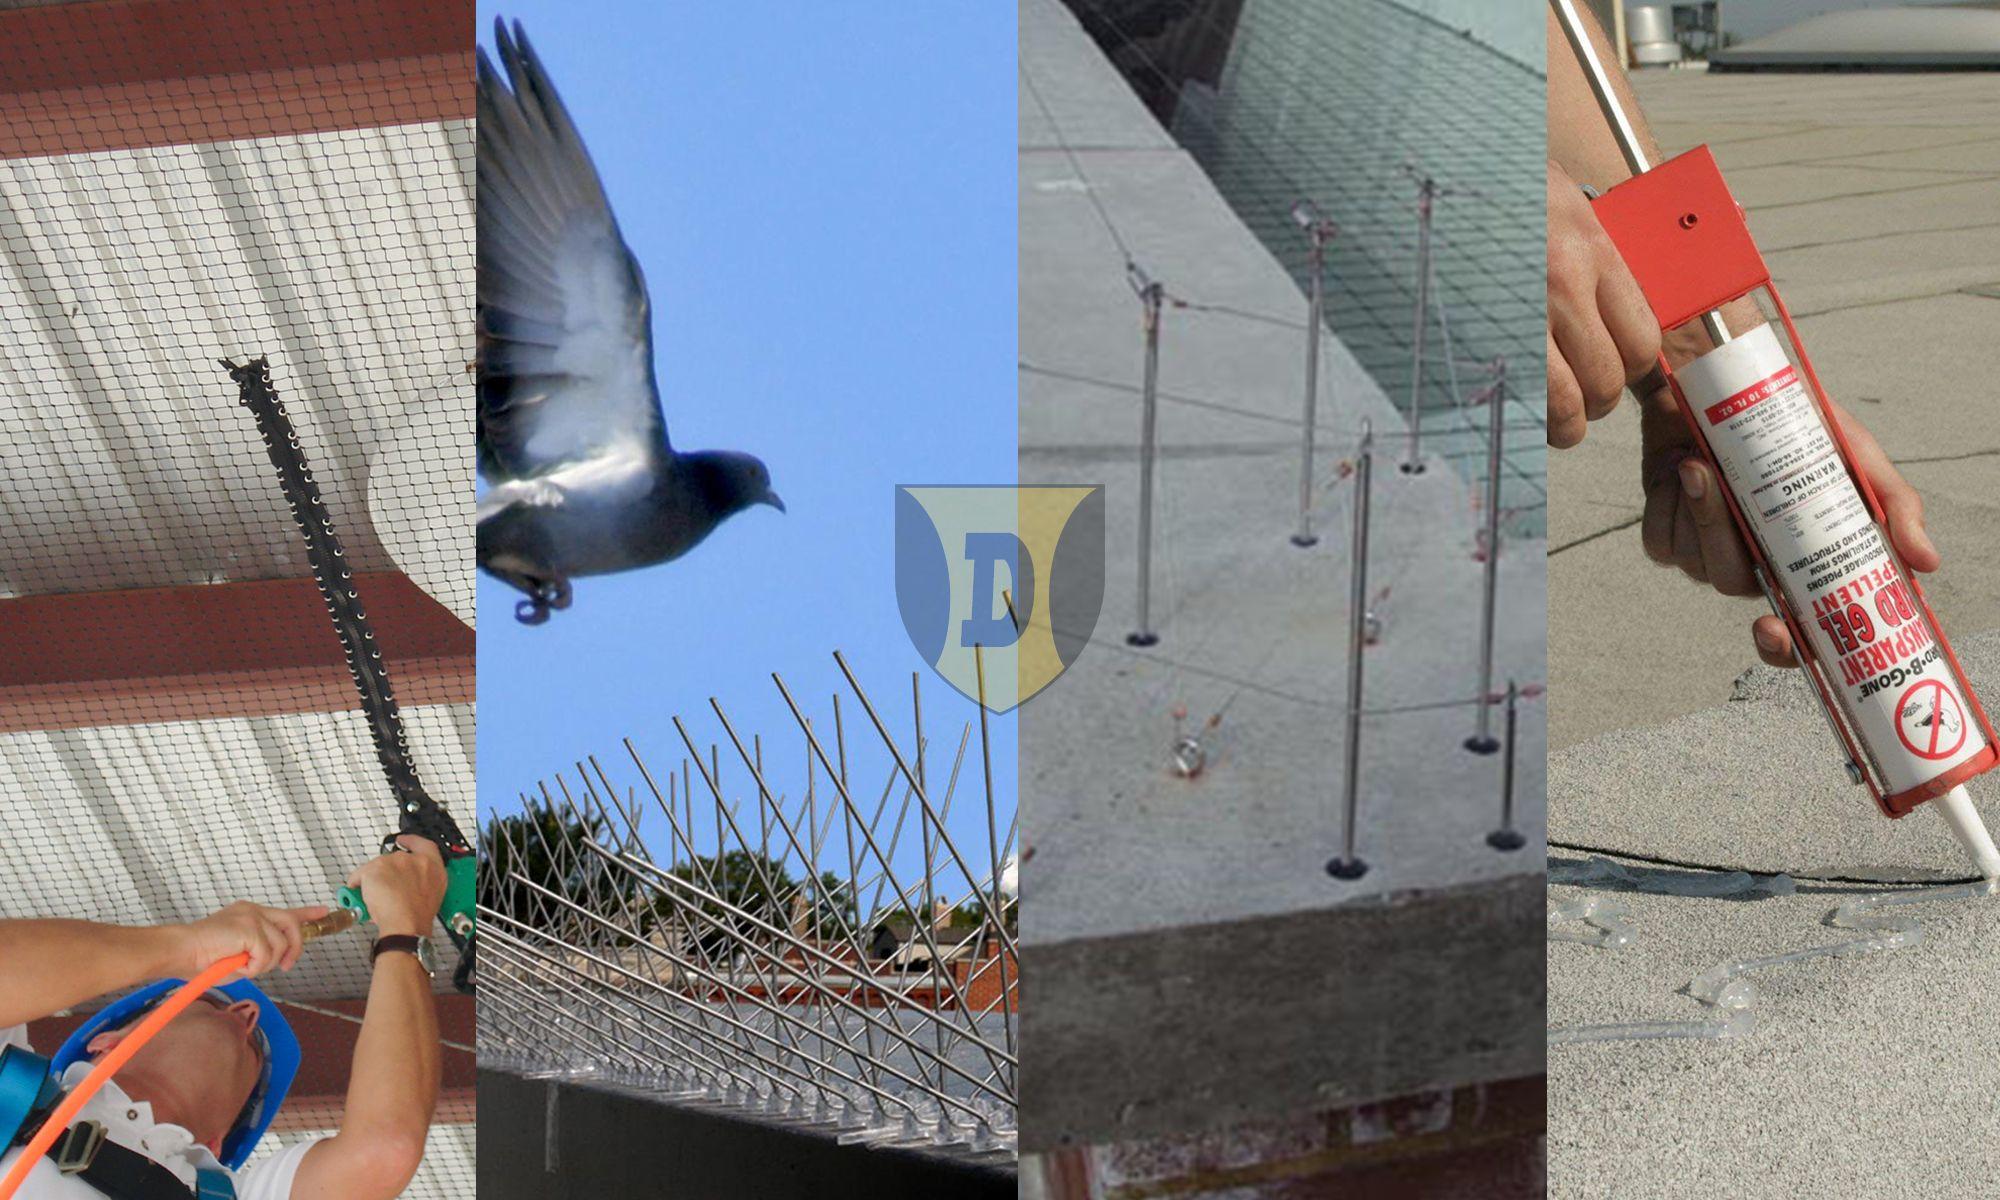 Protectie impotriva pasarilor - Montam si instalam sisteme de protectie contra pasarilor precum plase, spini, sarme sau gel